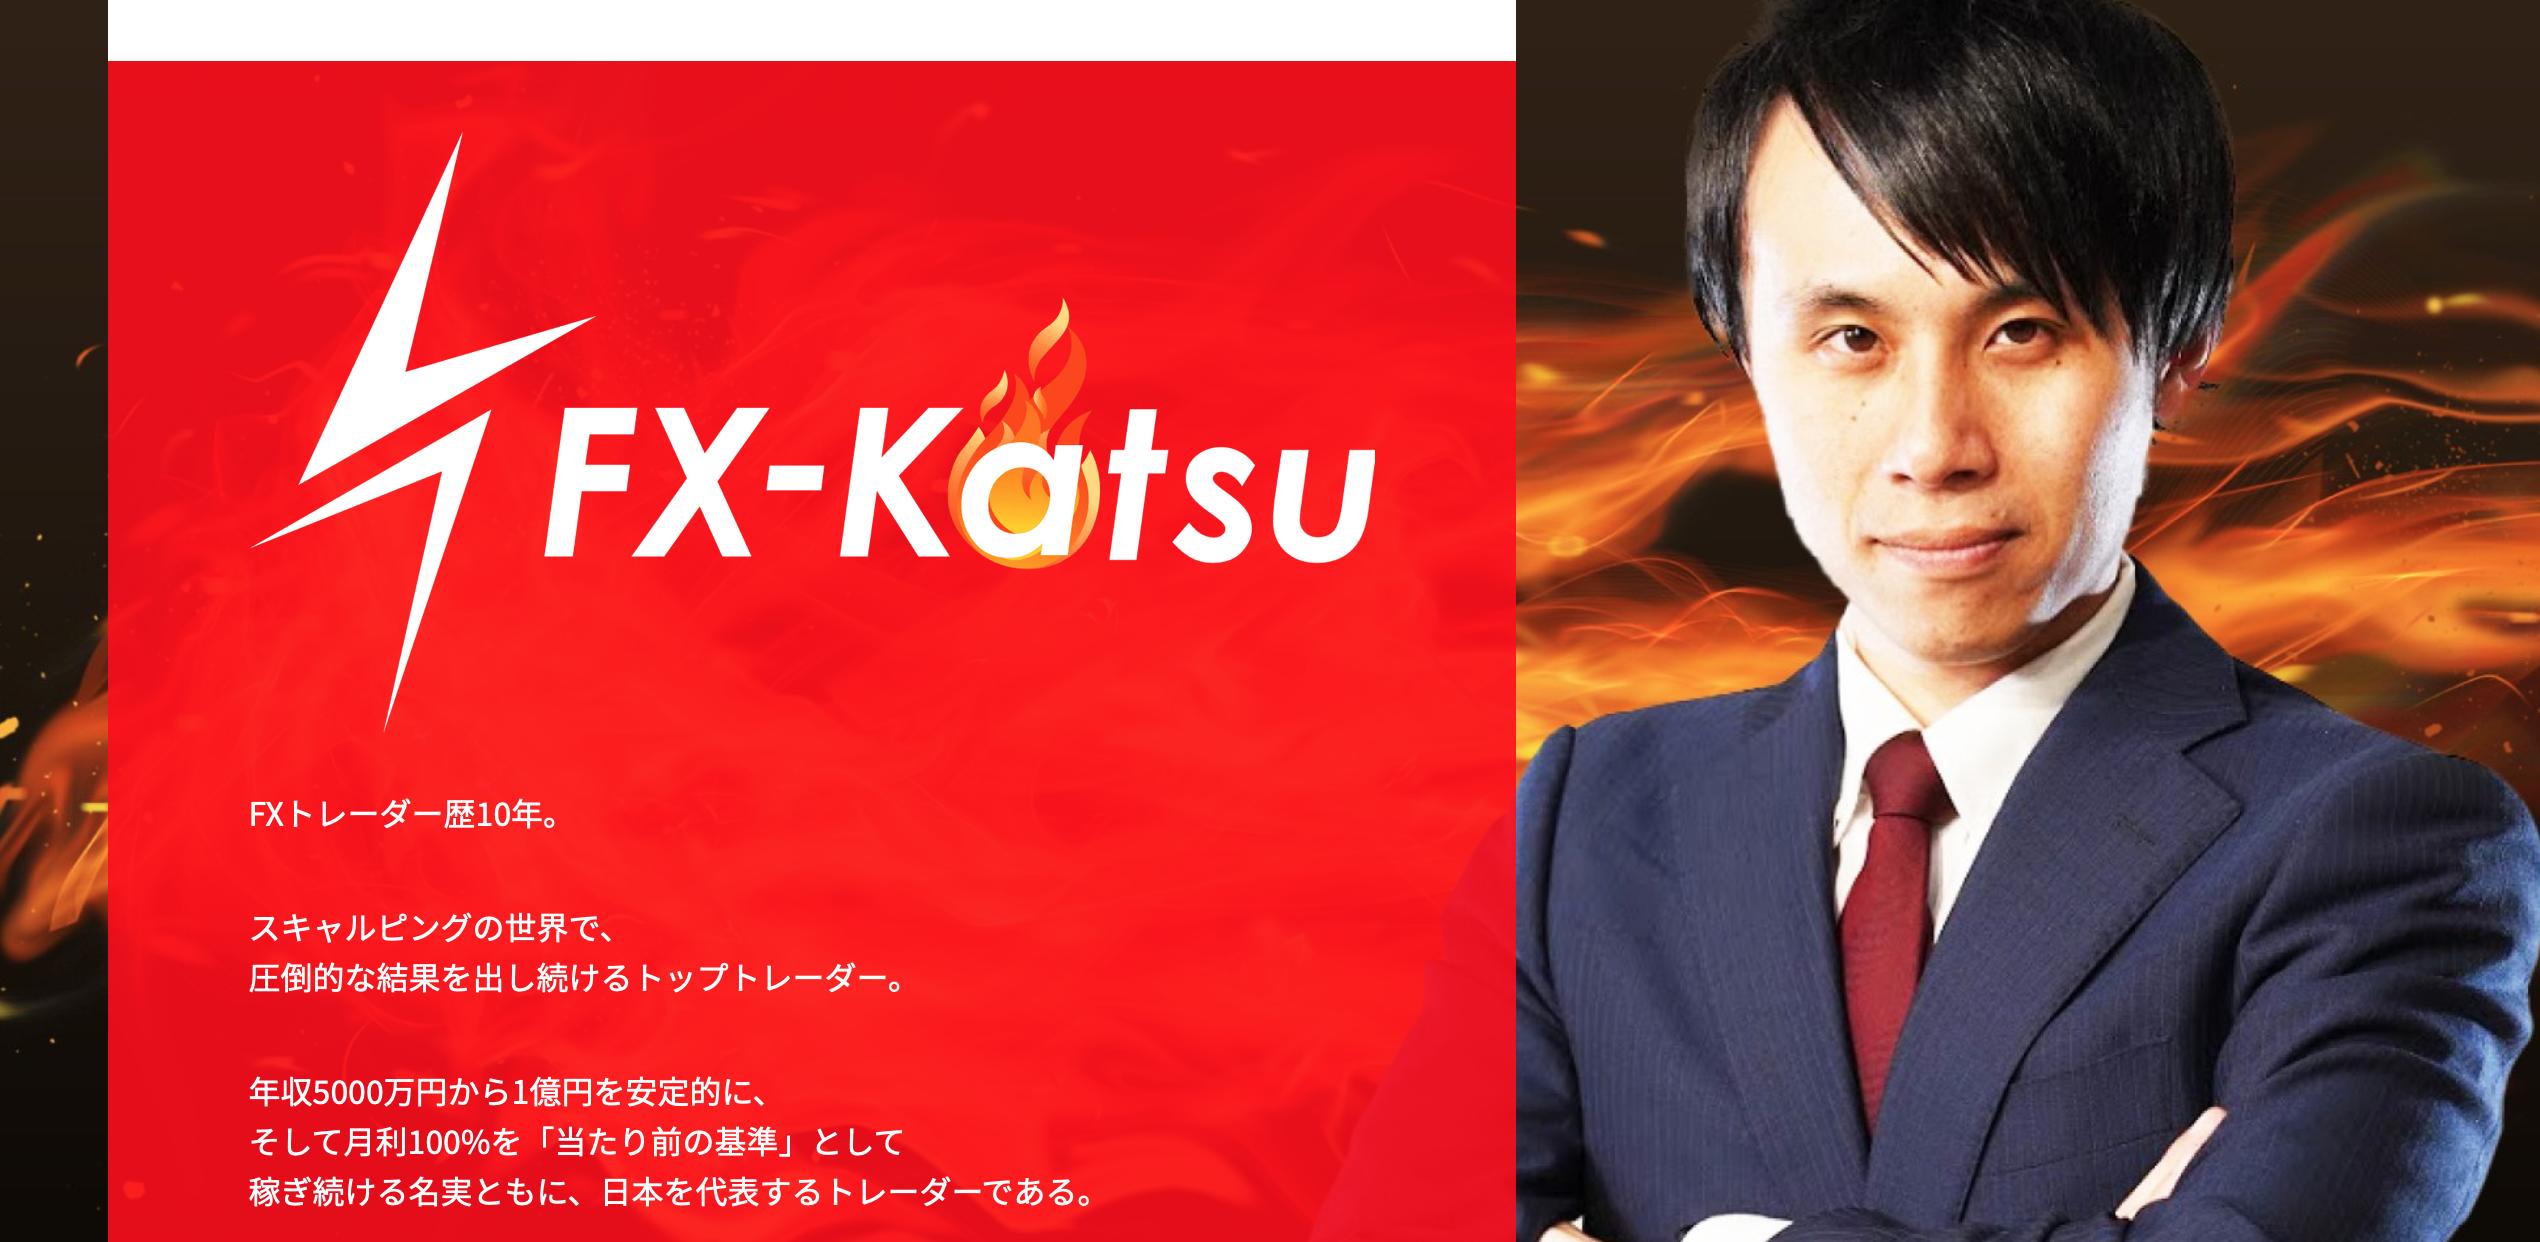 FXkatsu FXスキャルピング 成功のイデア4